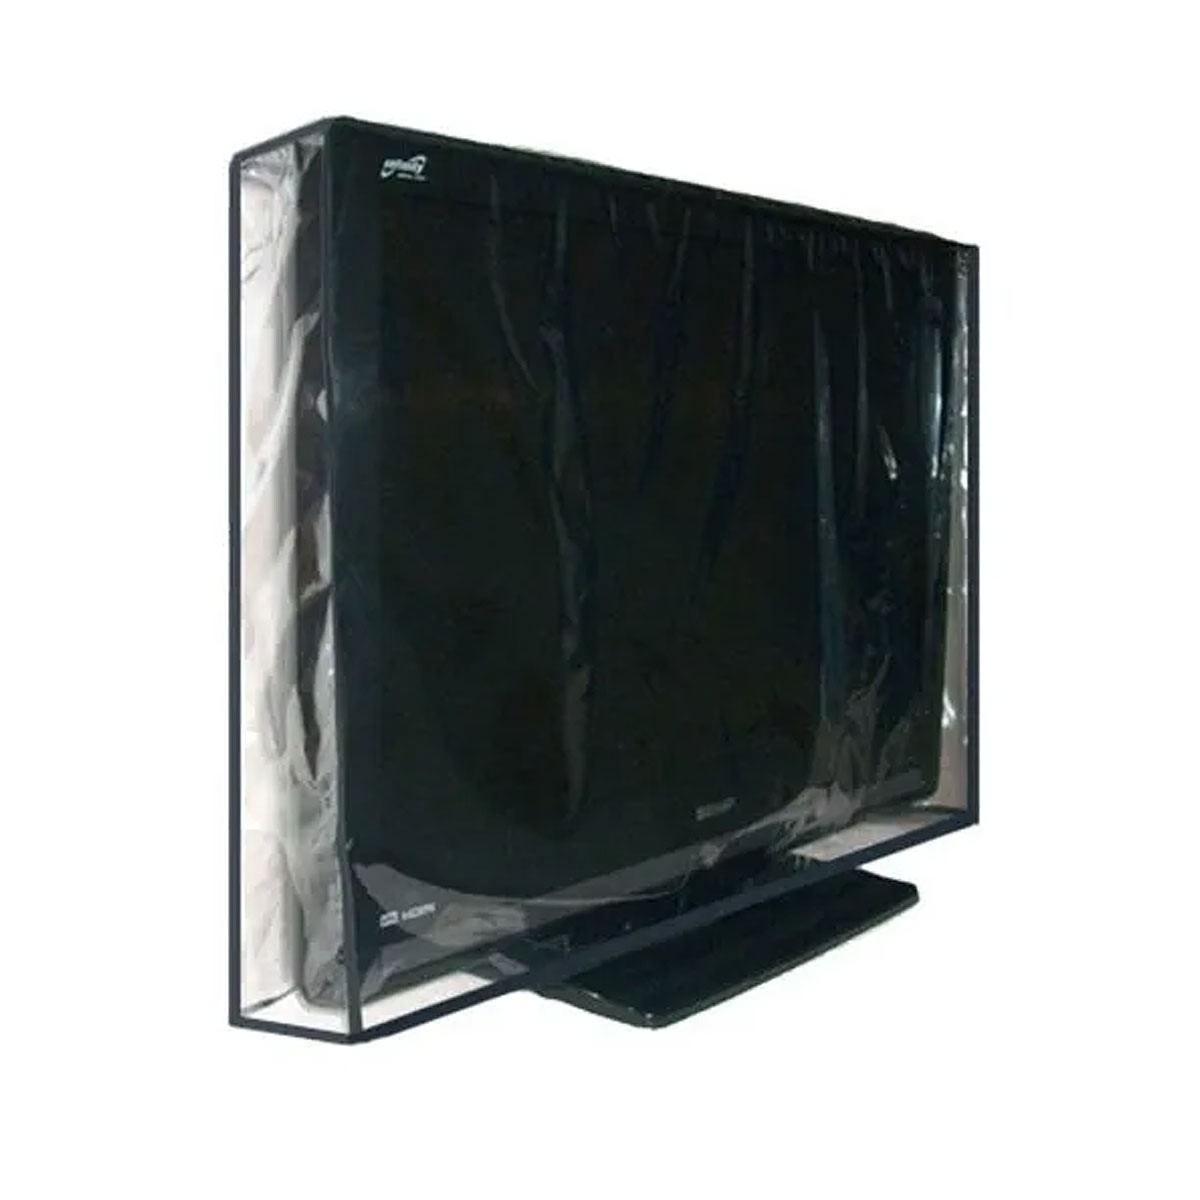 Capa Em Pvc Cristal Para Tv Led 32 - Aberta Atrás